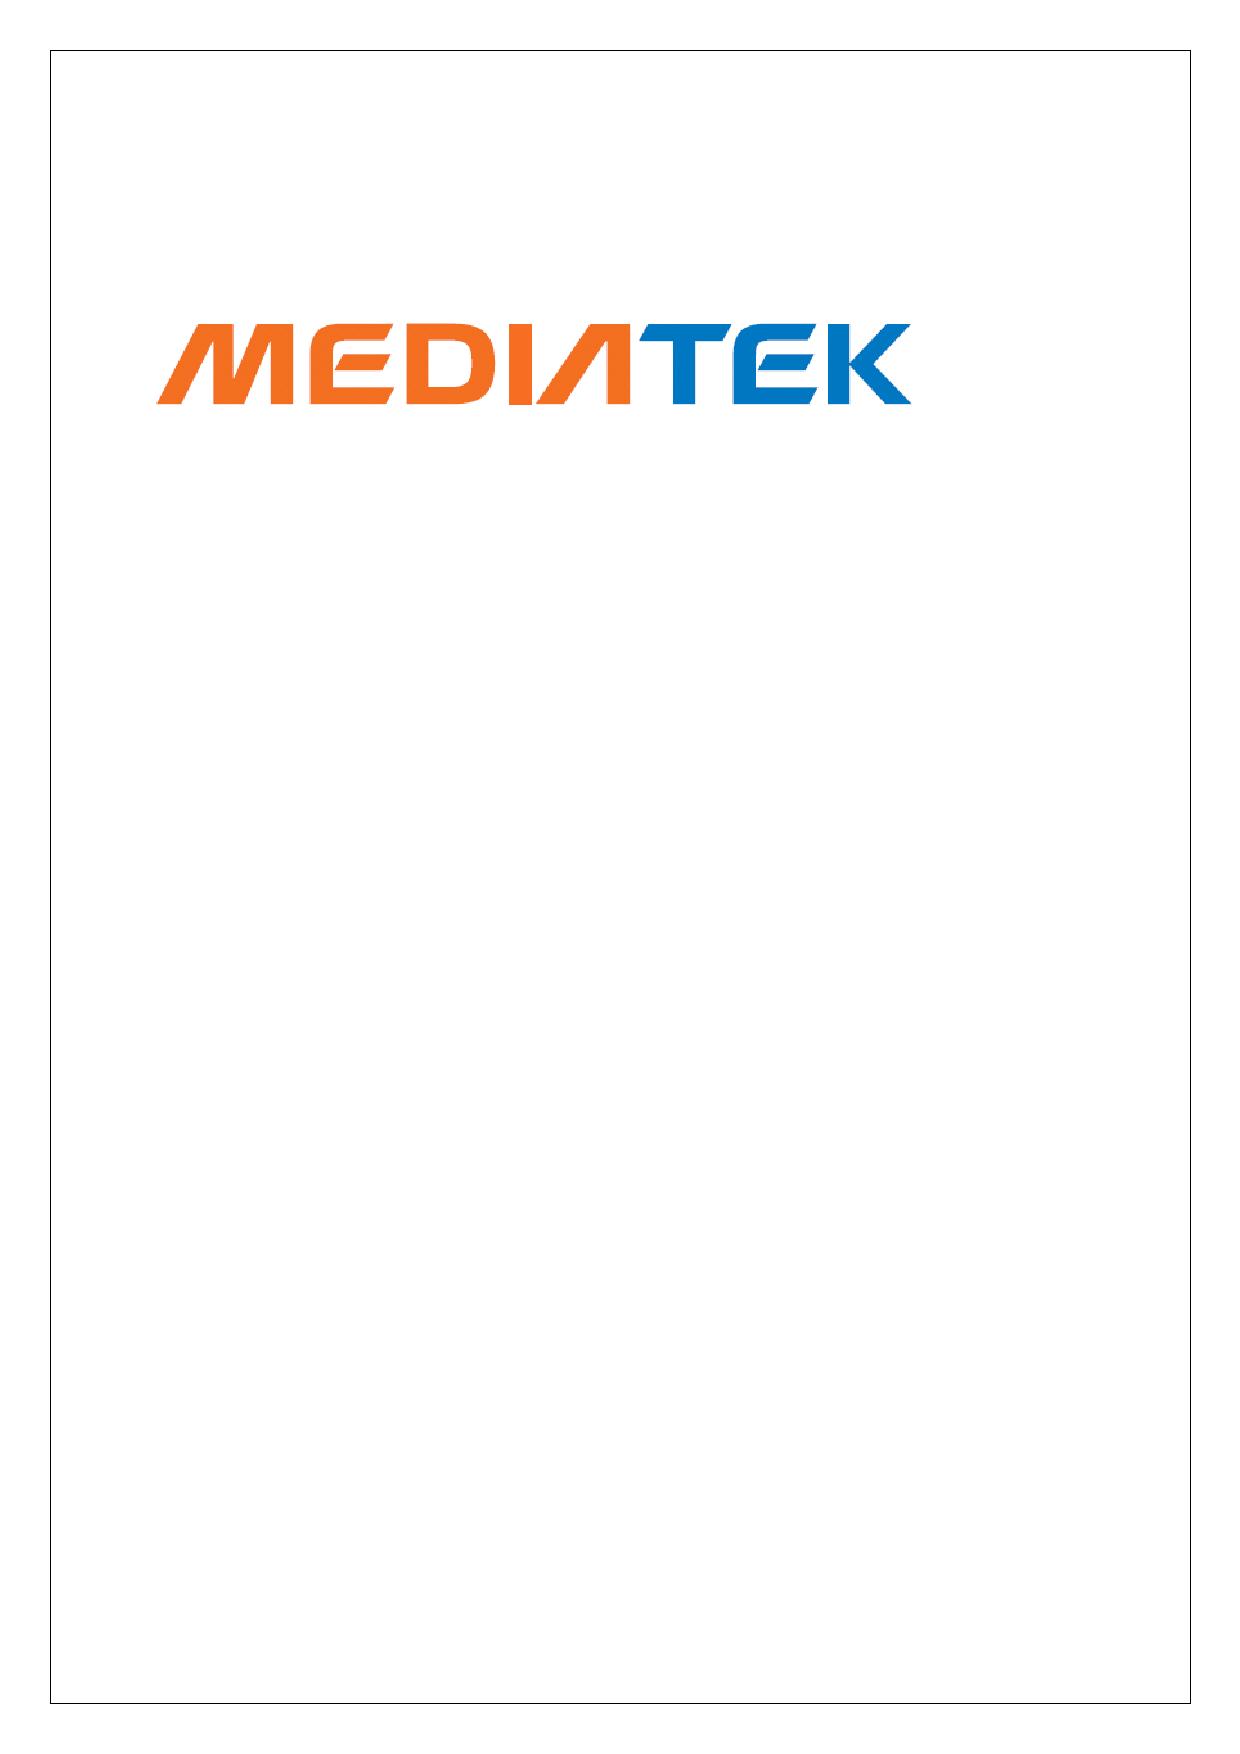 MT6589 datasheet